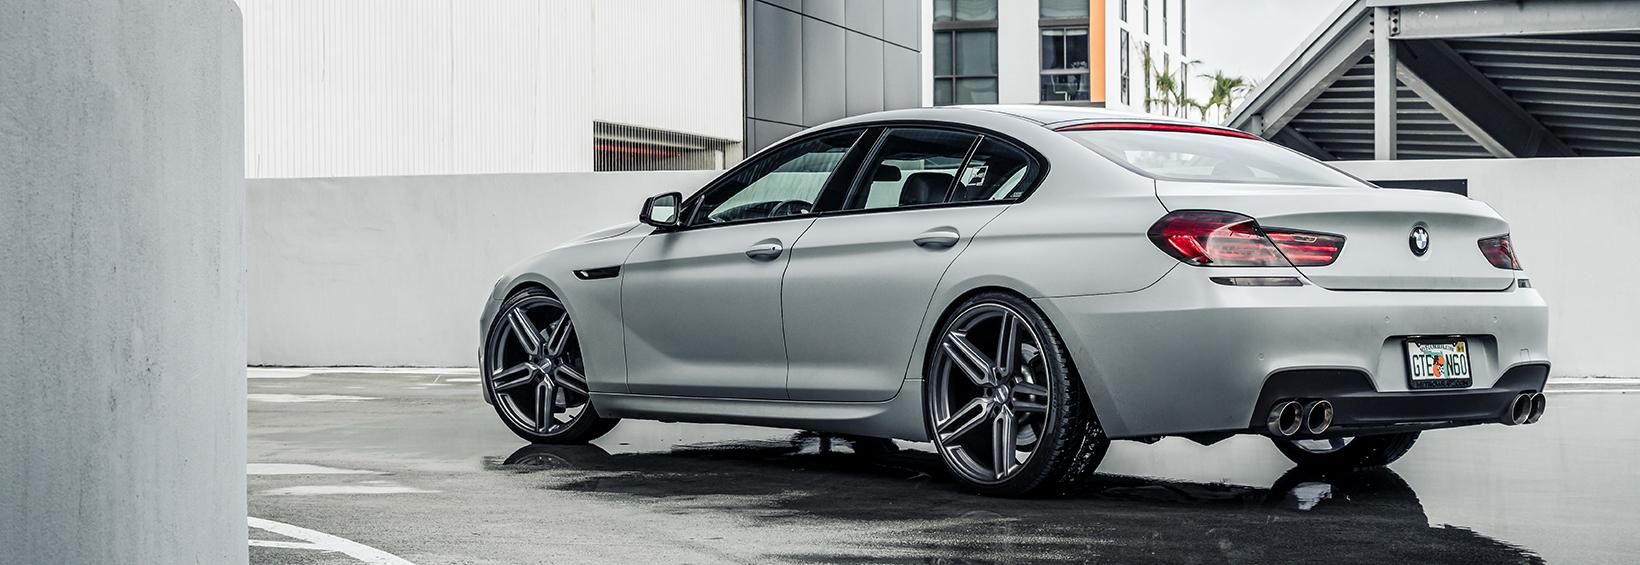 BMW-hero